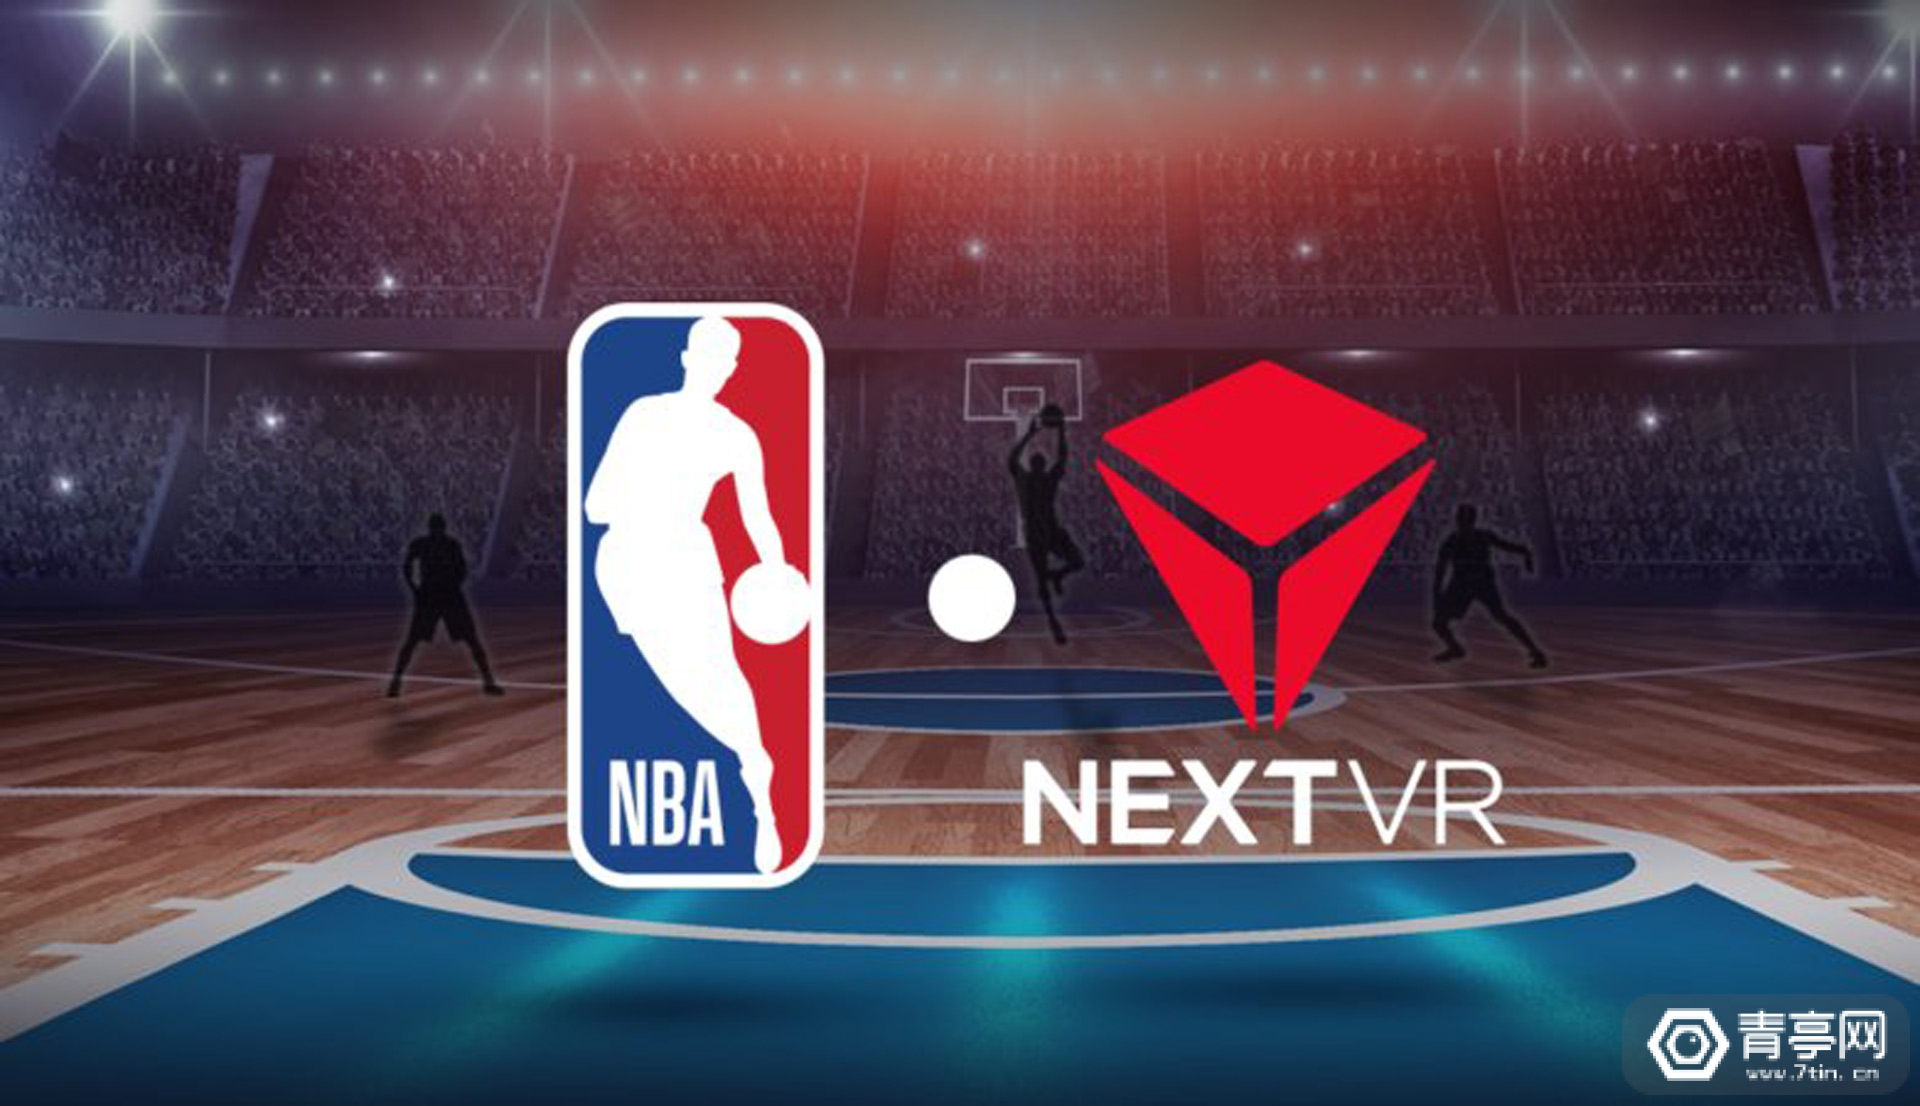 NextVR公布NBA 2019新赛季VR直播时间表,共26场比赛